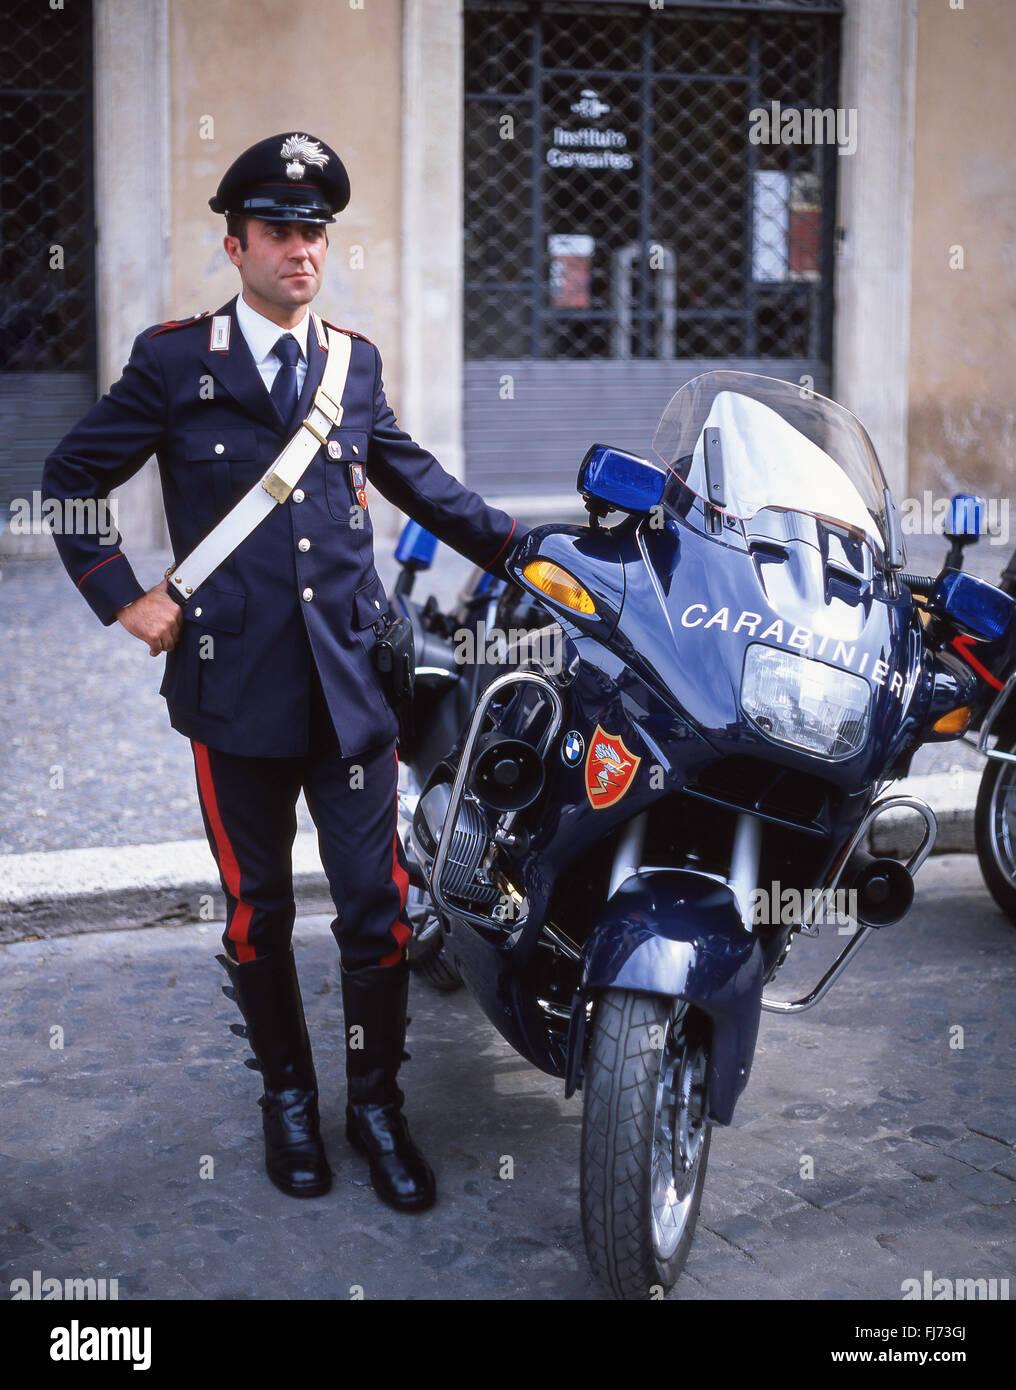 Italian policeman (Carabinieri) standing by motorbike, Rome, Rome Province, Lazio Region, Italy - Stock Image